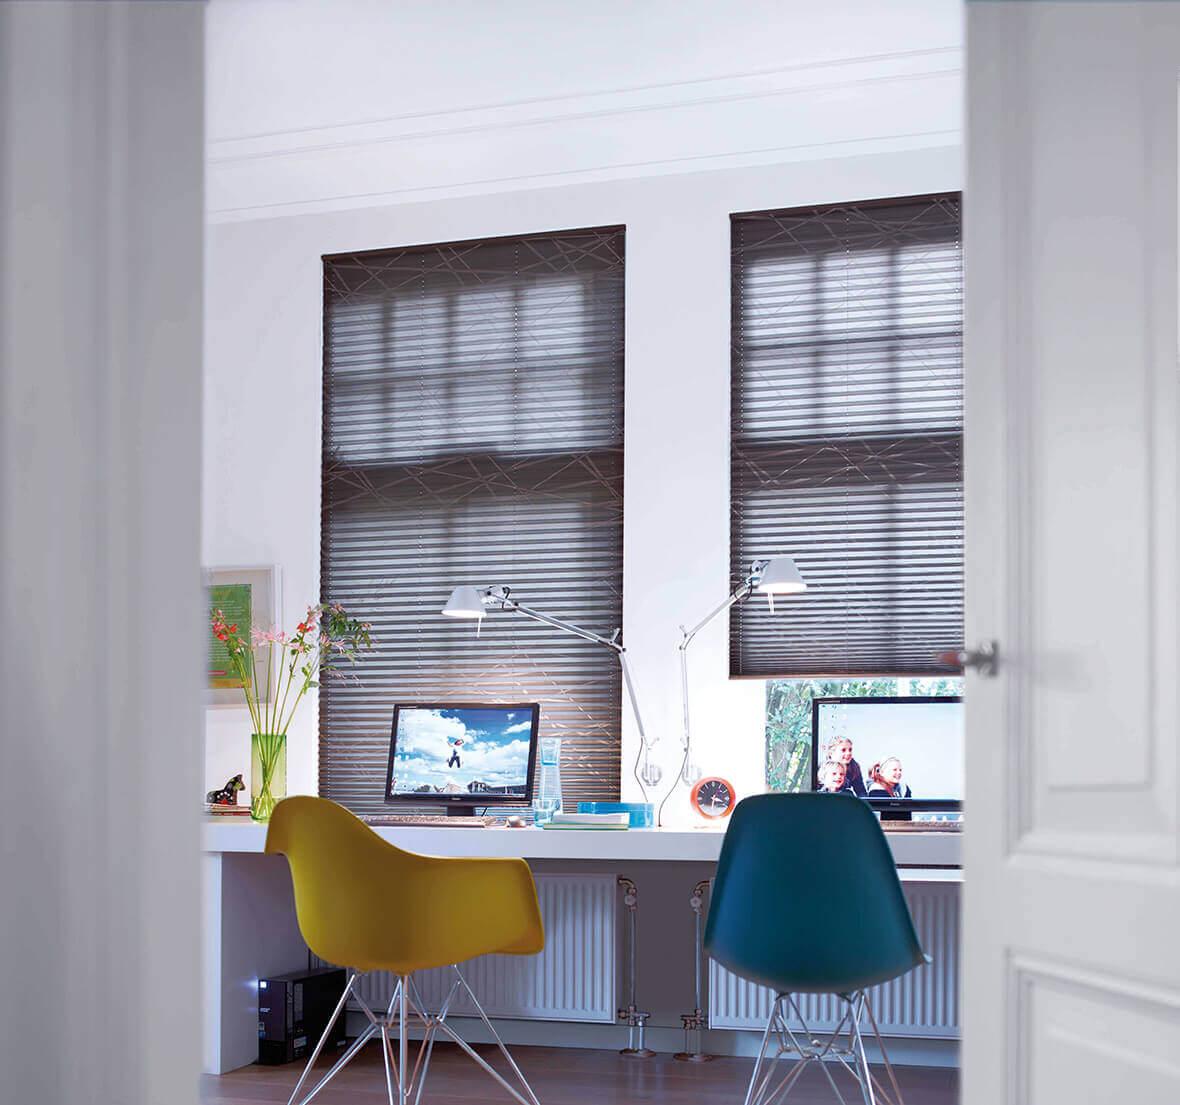 plissee hersteller vergleich good plissee with plissee hersteller vergleich trendy decomatic. Black Bedroom Furniture Sets. Home Design Ideas